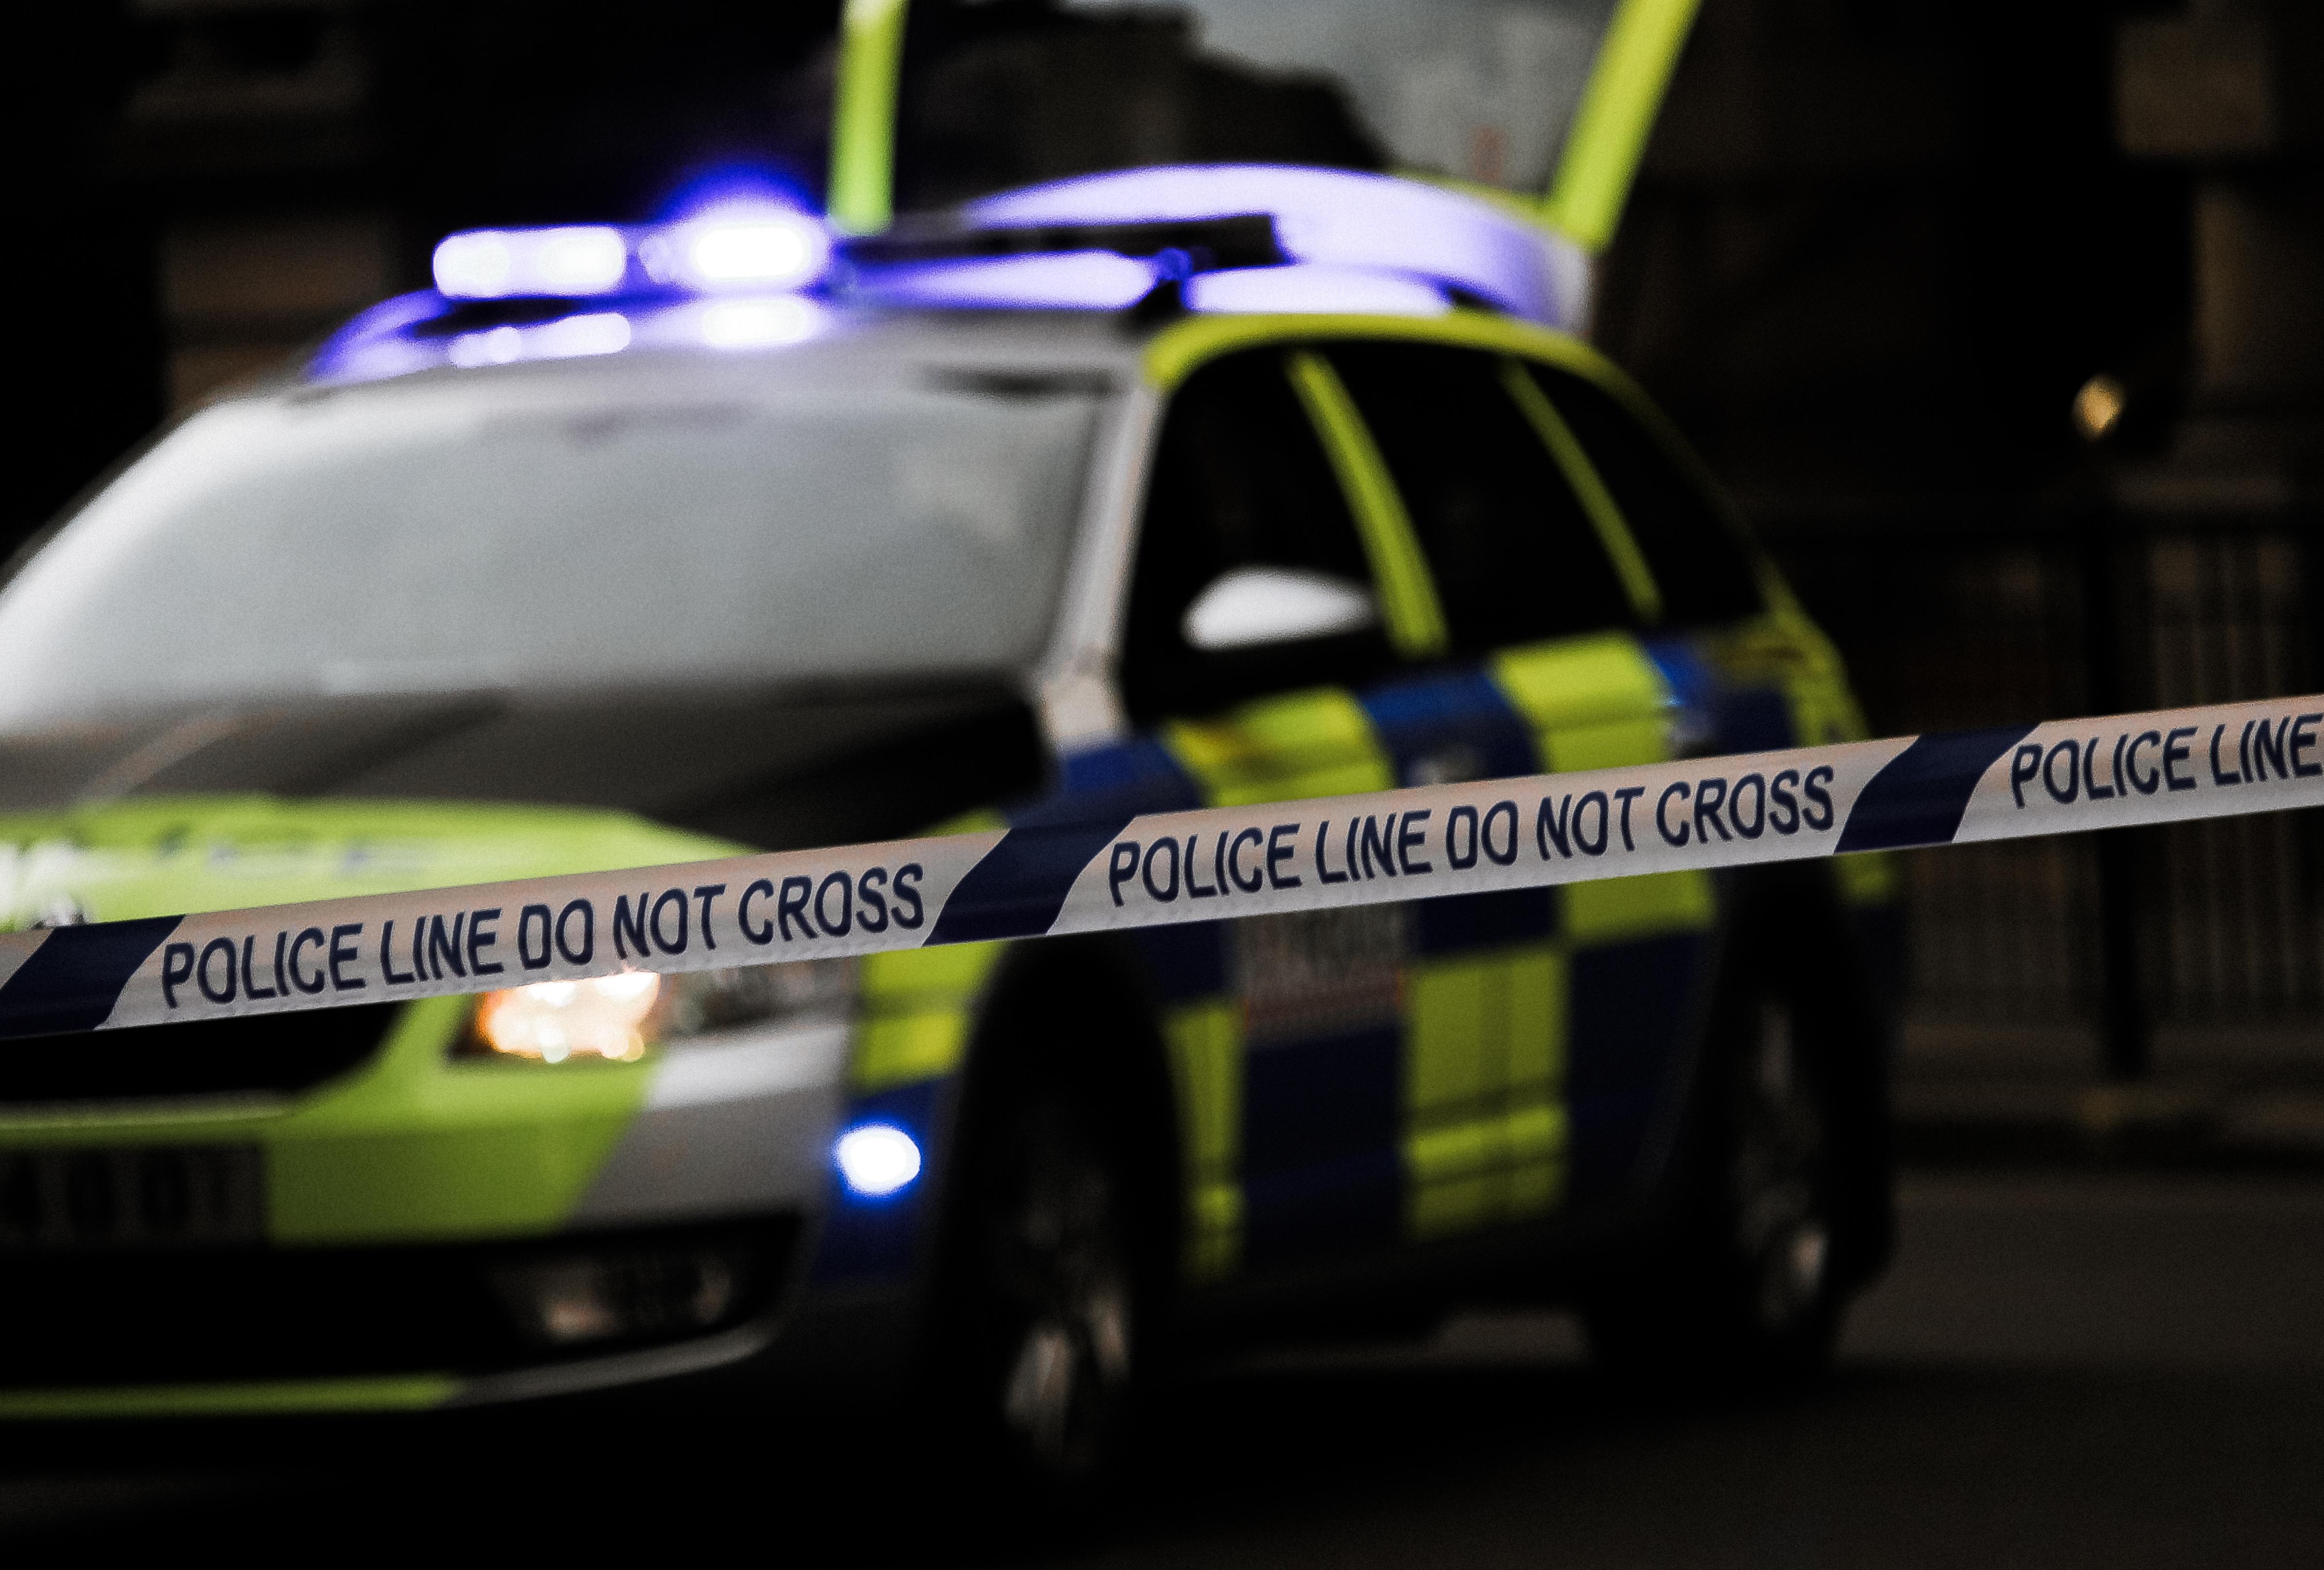 Free Images : blur, taxi, profession, law enforcement, police car ...